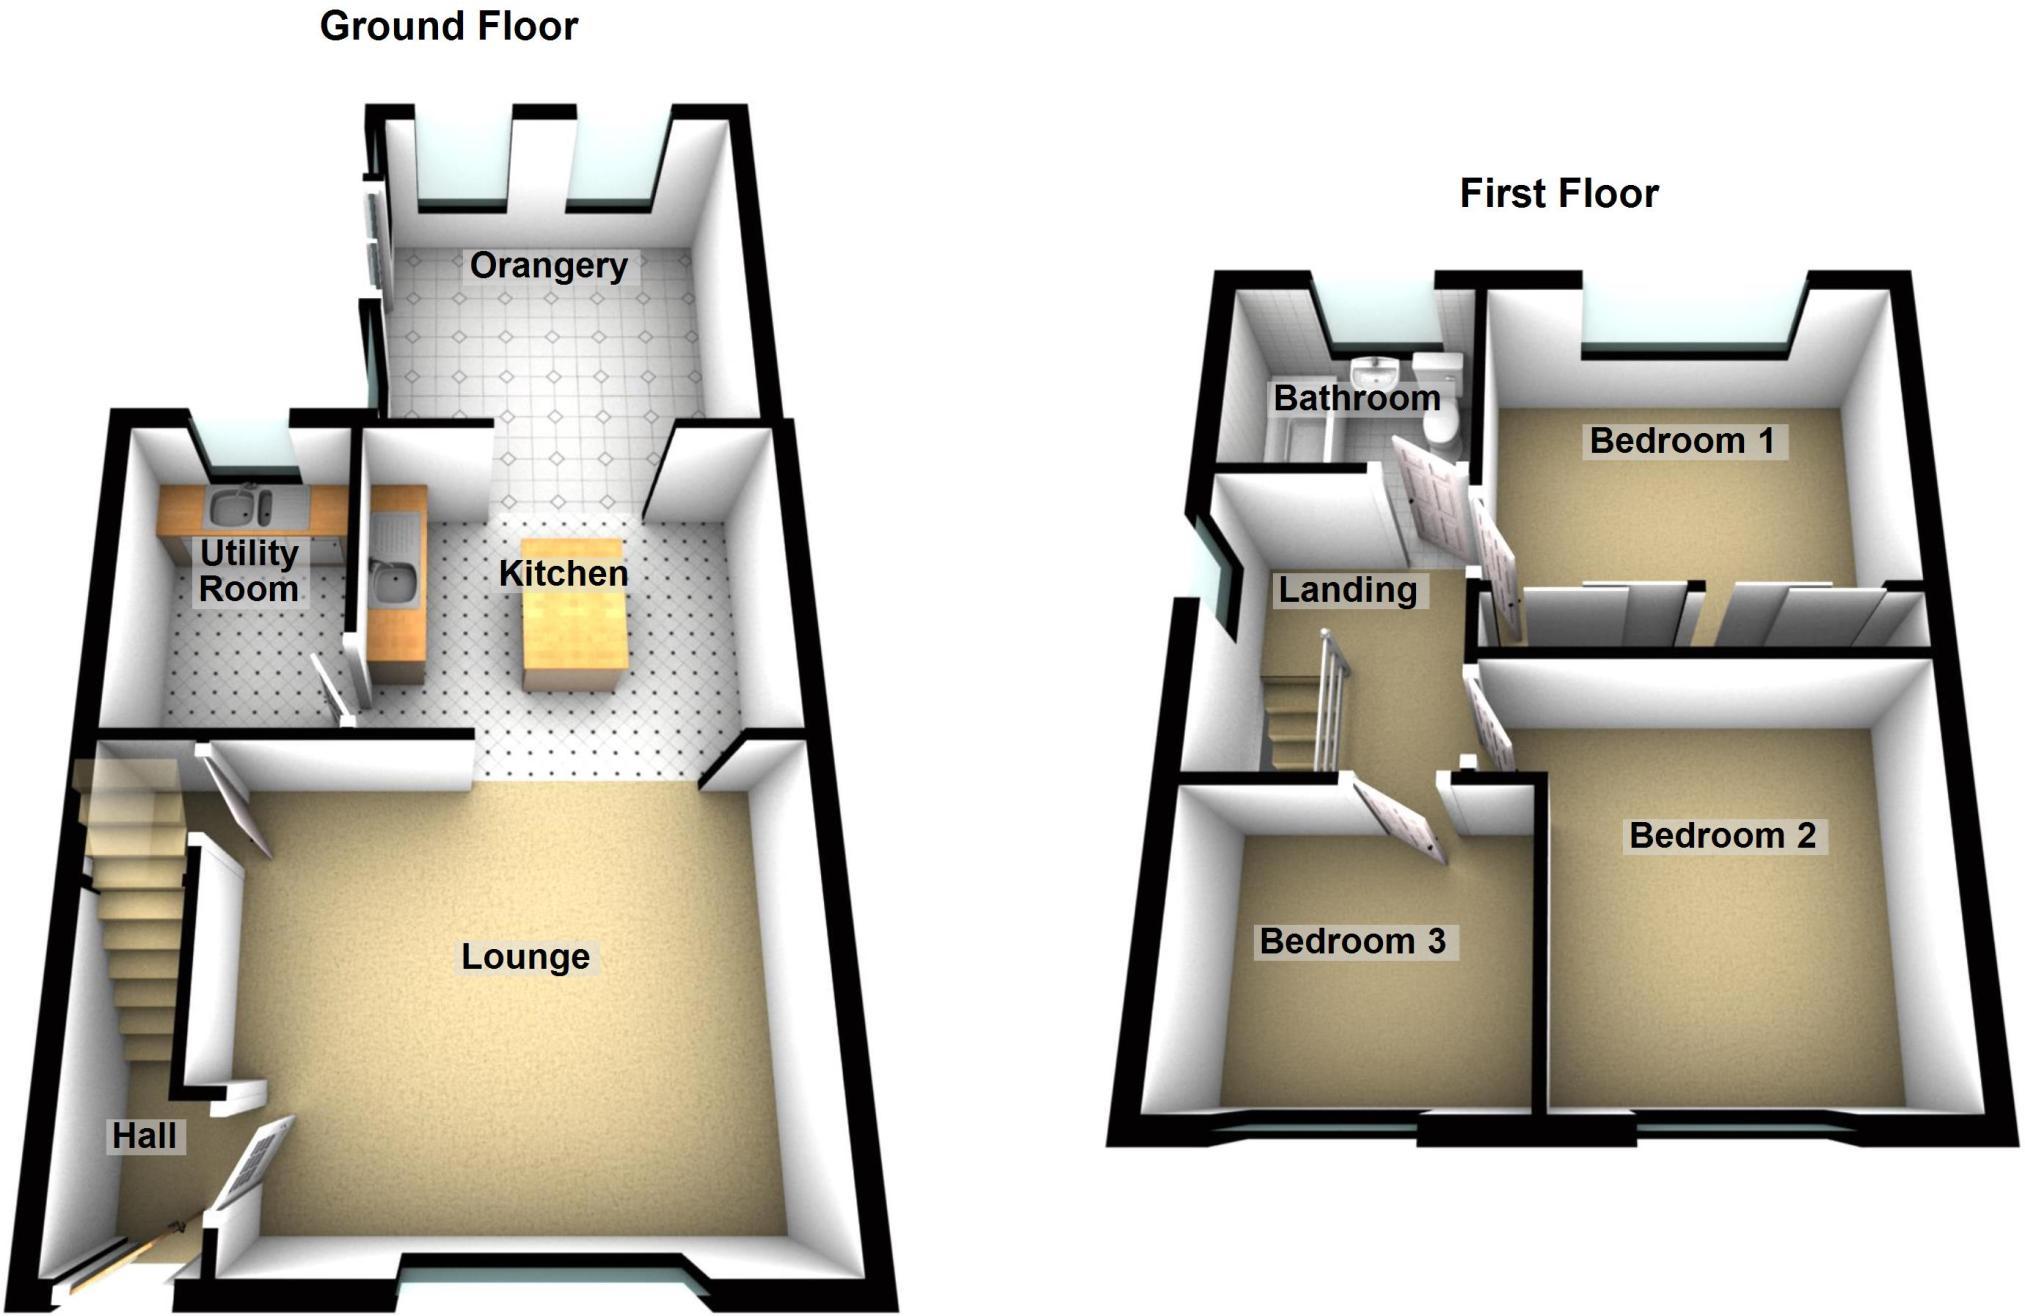 100 Terraced House Floor Plans Colors – British House Floor Plans